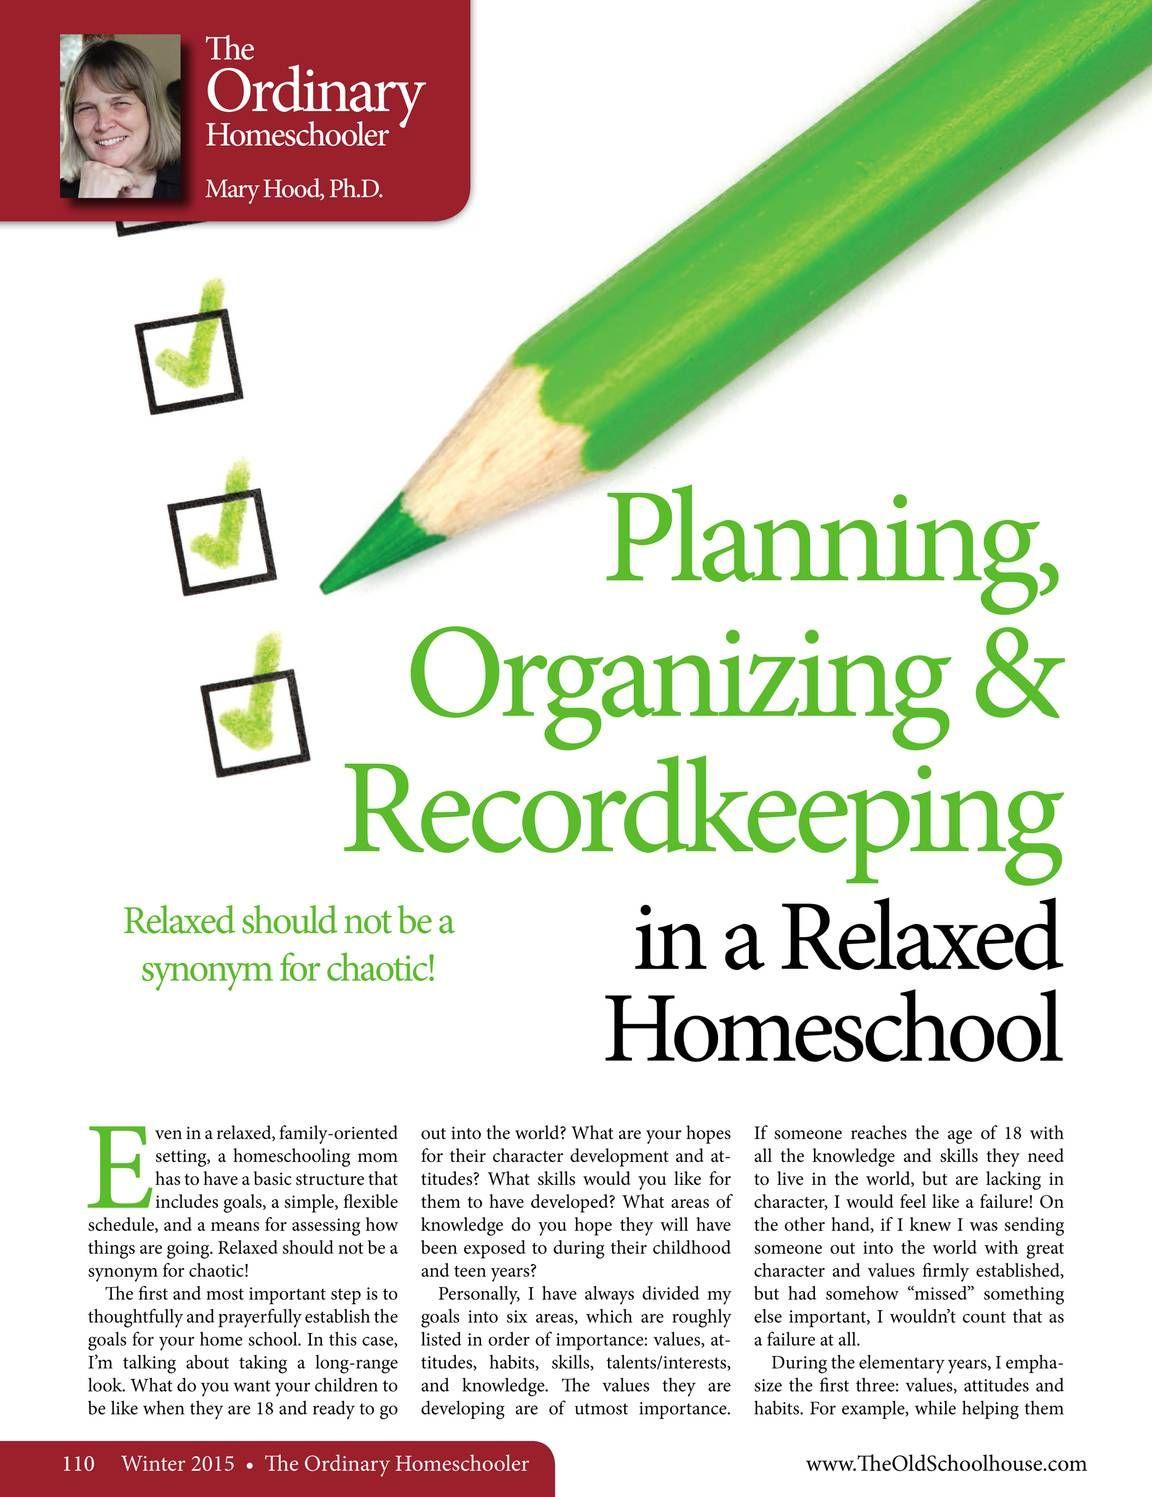 The Old Schoolhouse Magazine